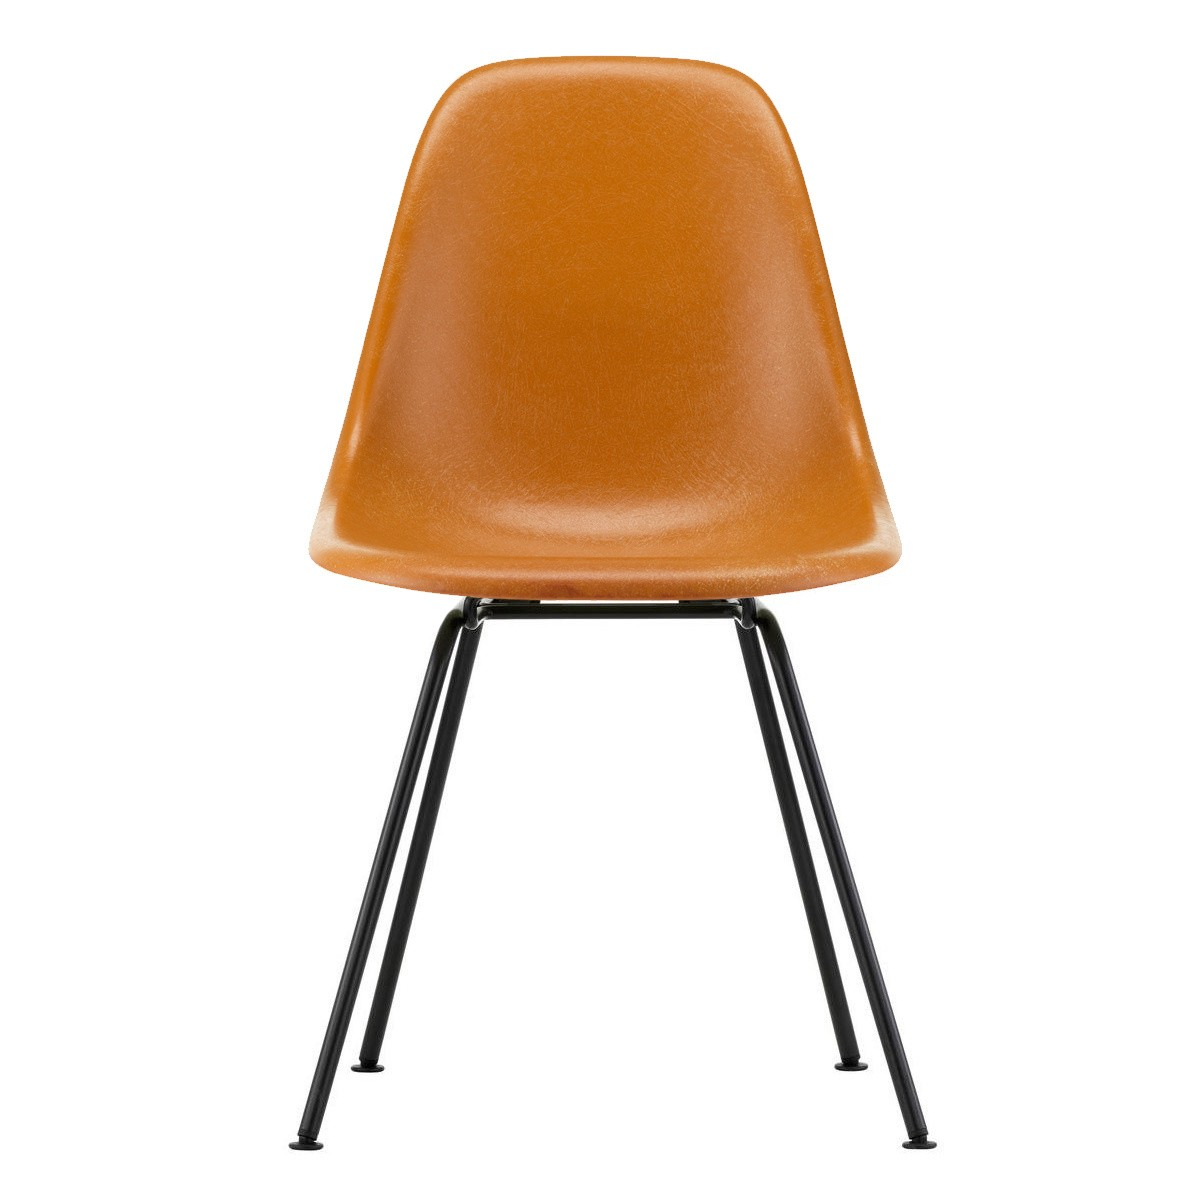 Vitra Eames Fiberglass Side Chair DSX schwarz 1200x1200 ID 90dead4ea d14d7f5f445ad3